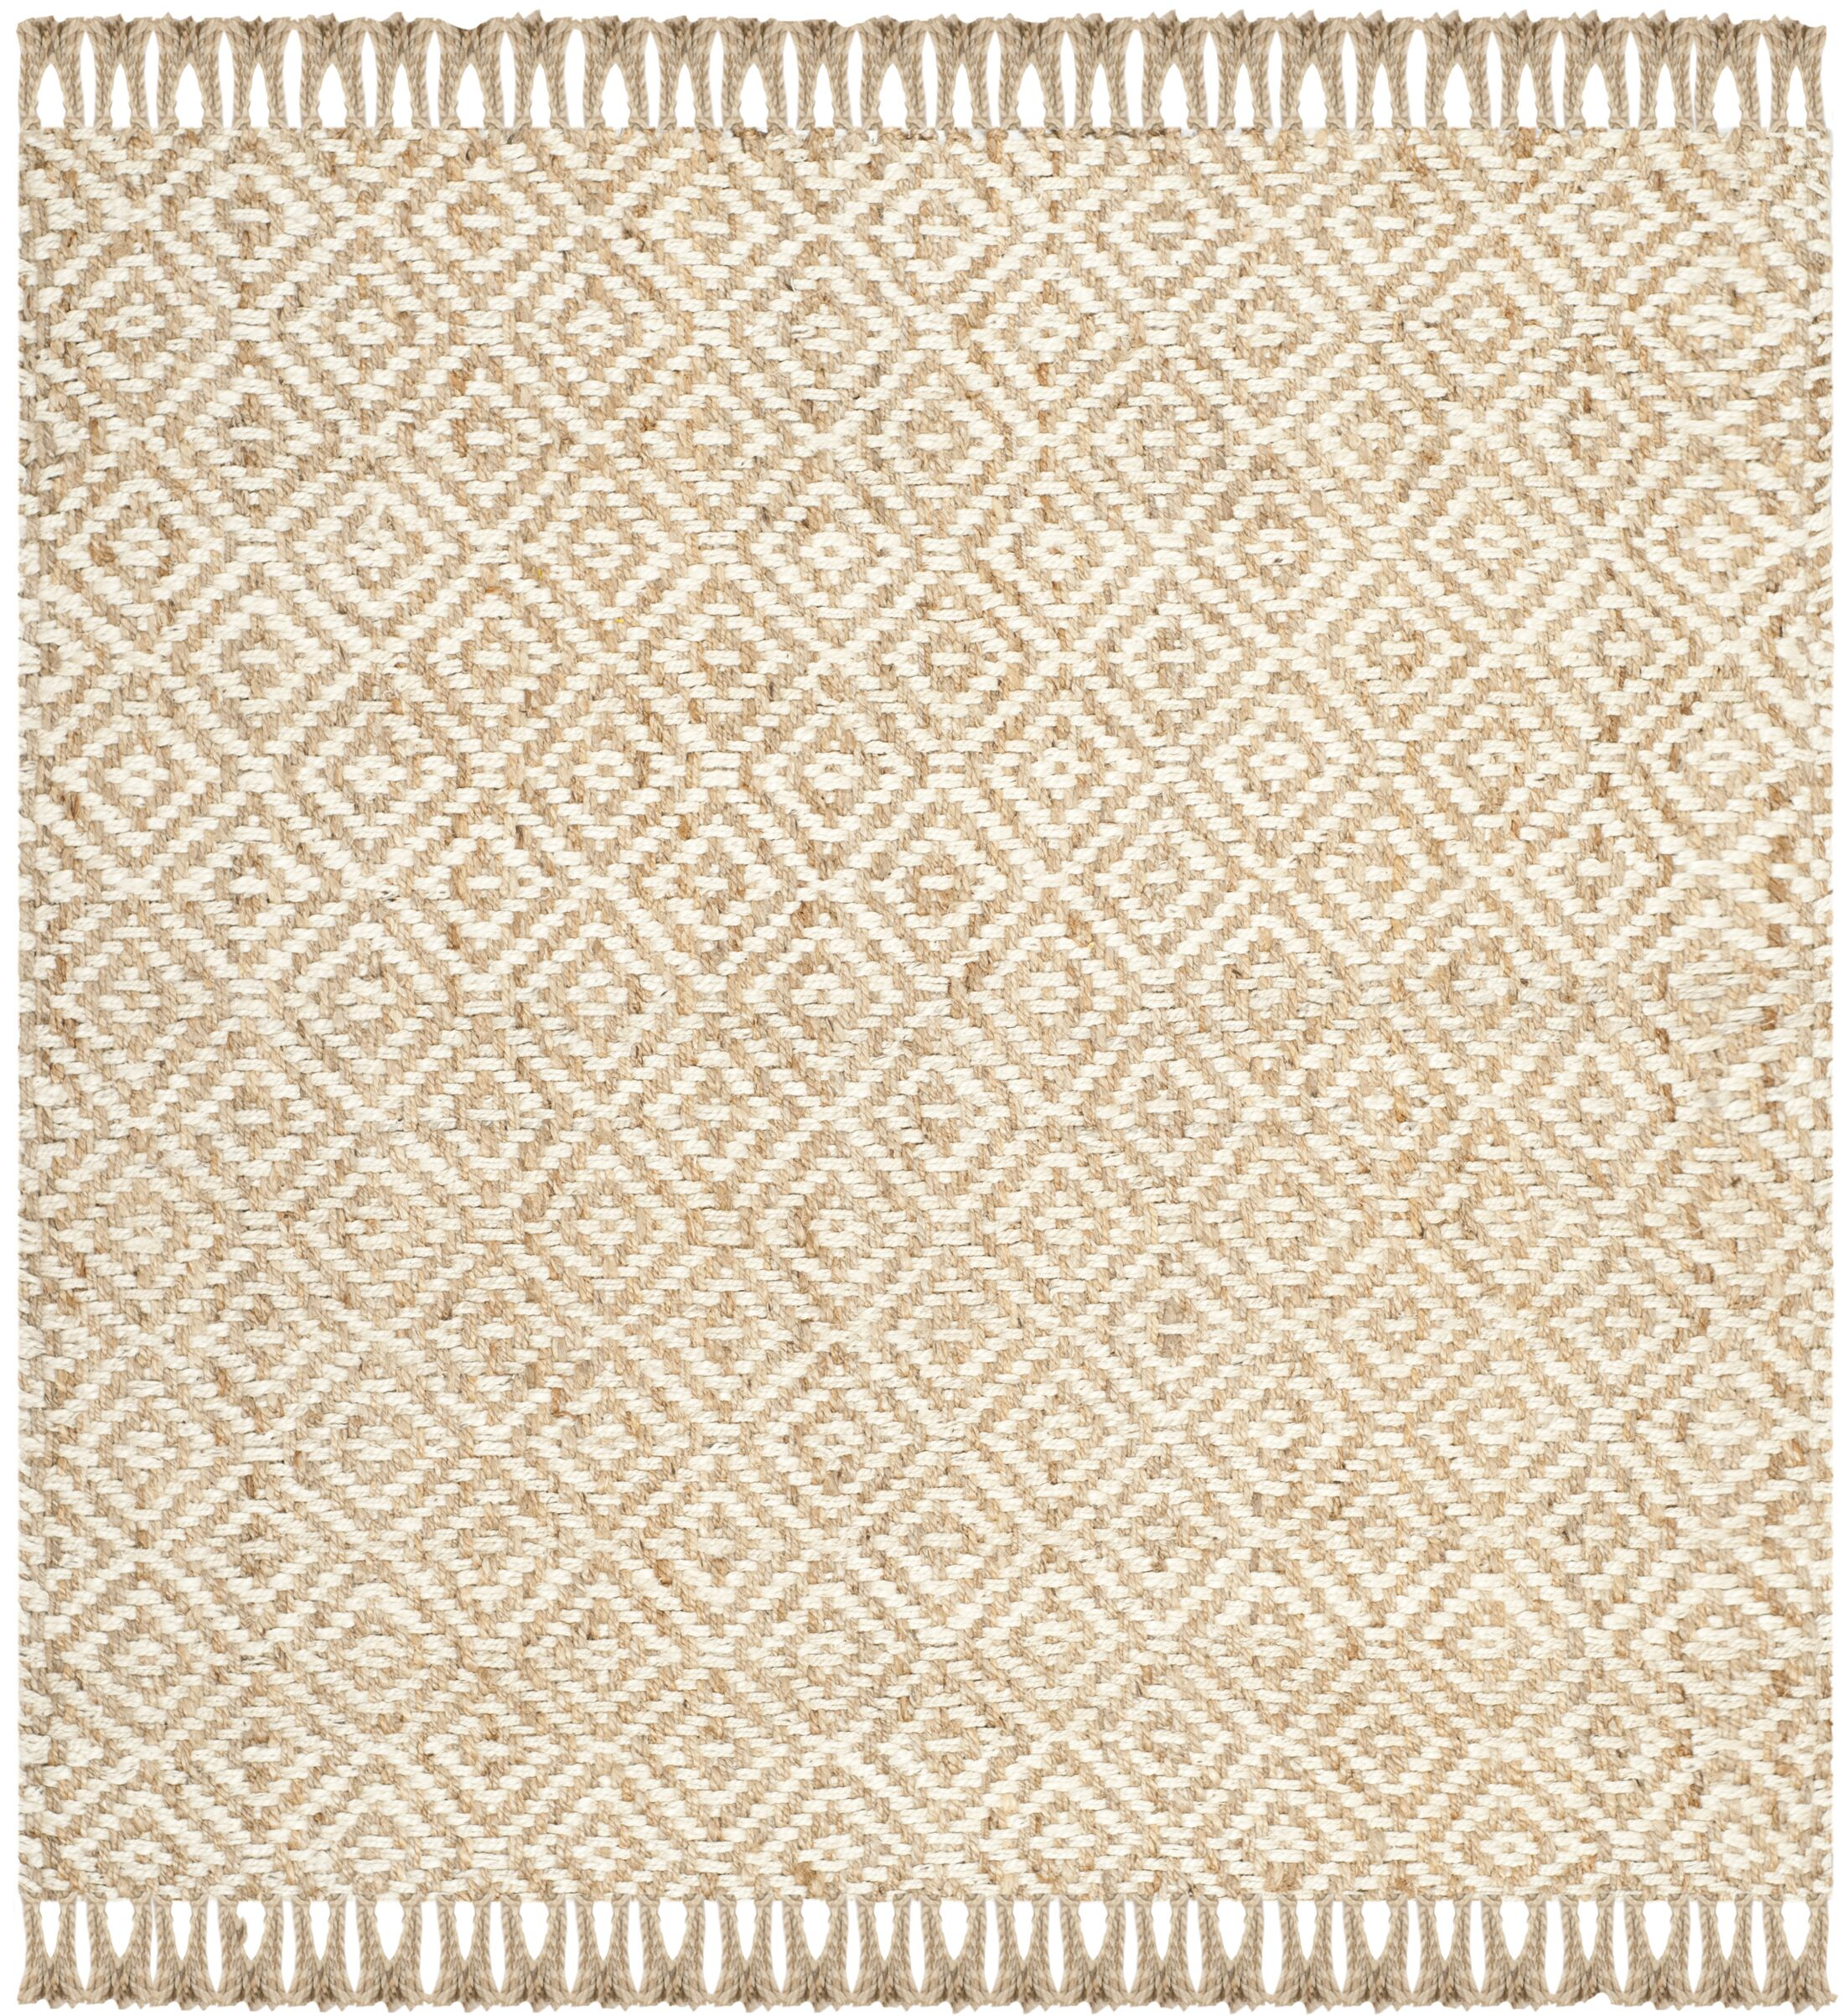 Monagra Handmade Natural/Ivory Natural Fiber Area Rug Rug Size: Square 8'